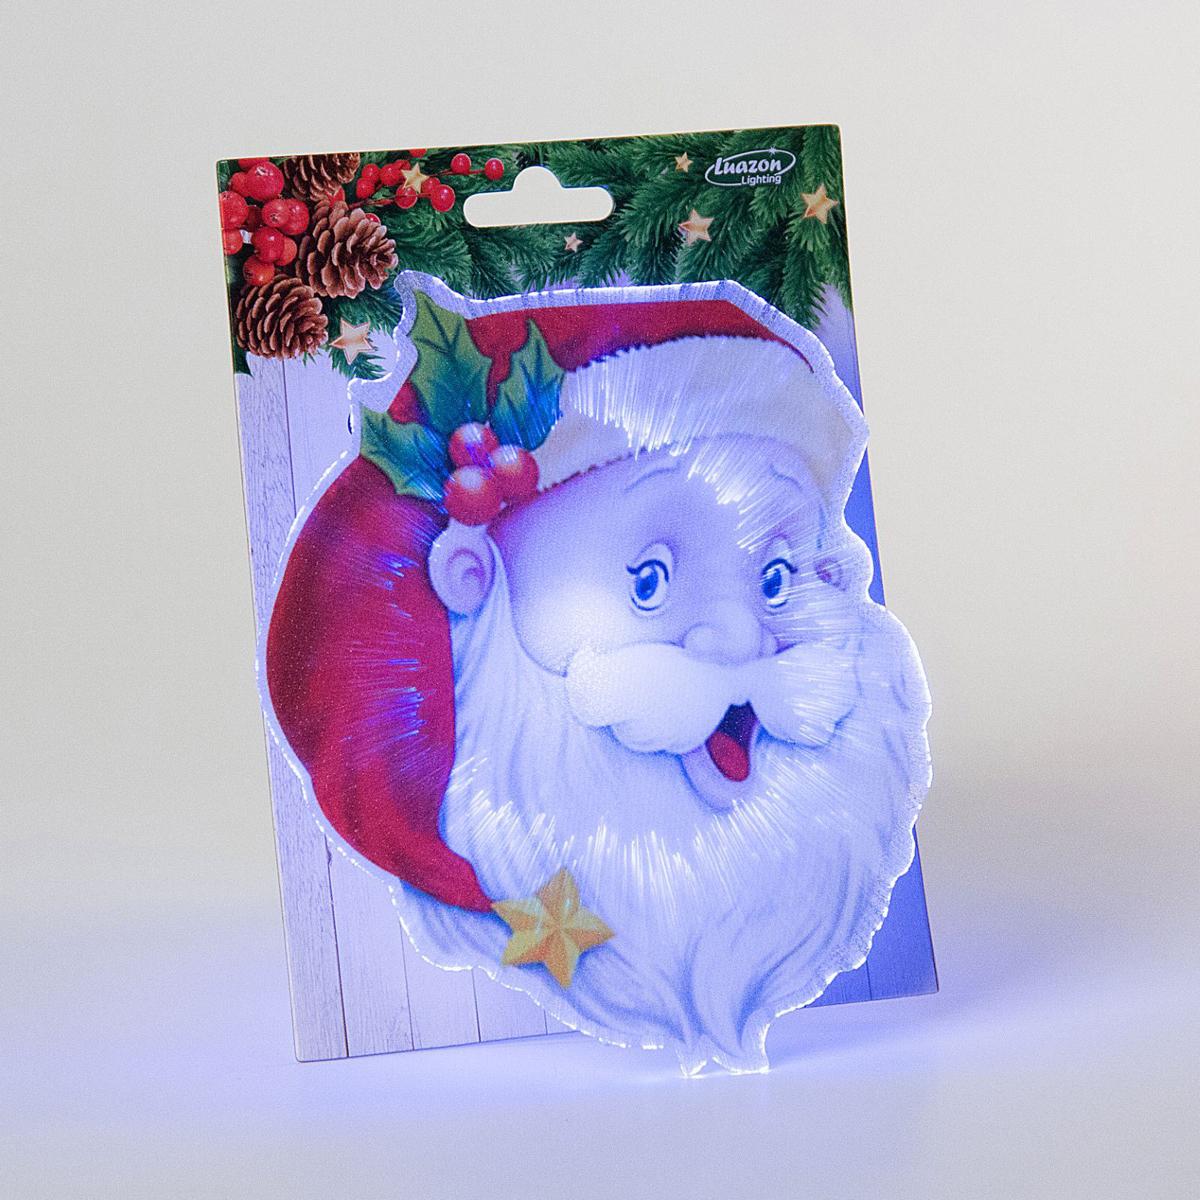 "Картинка световая Luazon ""Дед Мороз"", на магните"